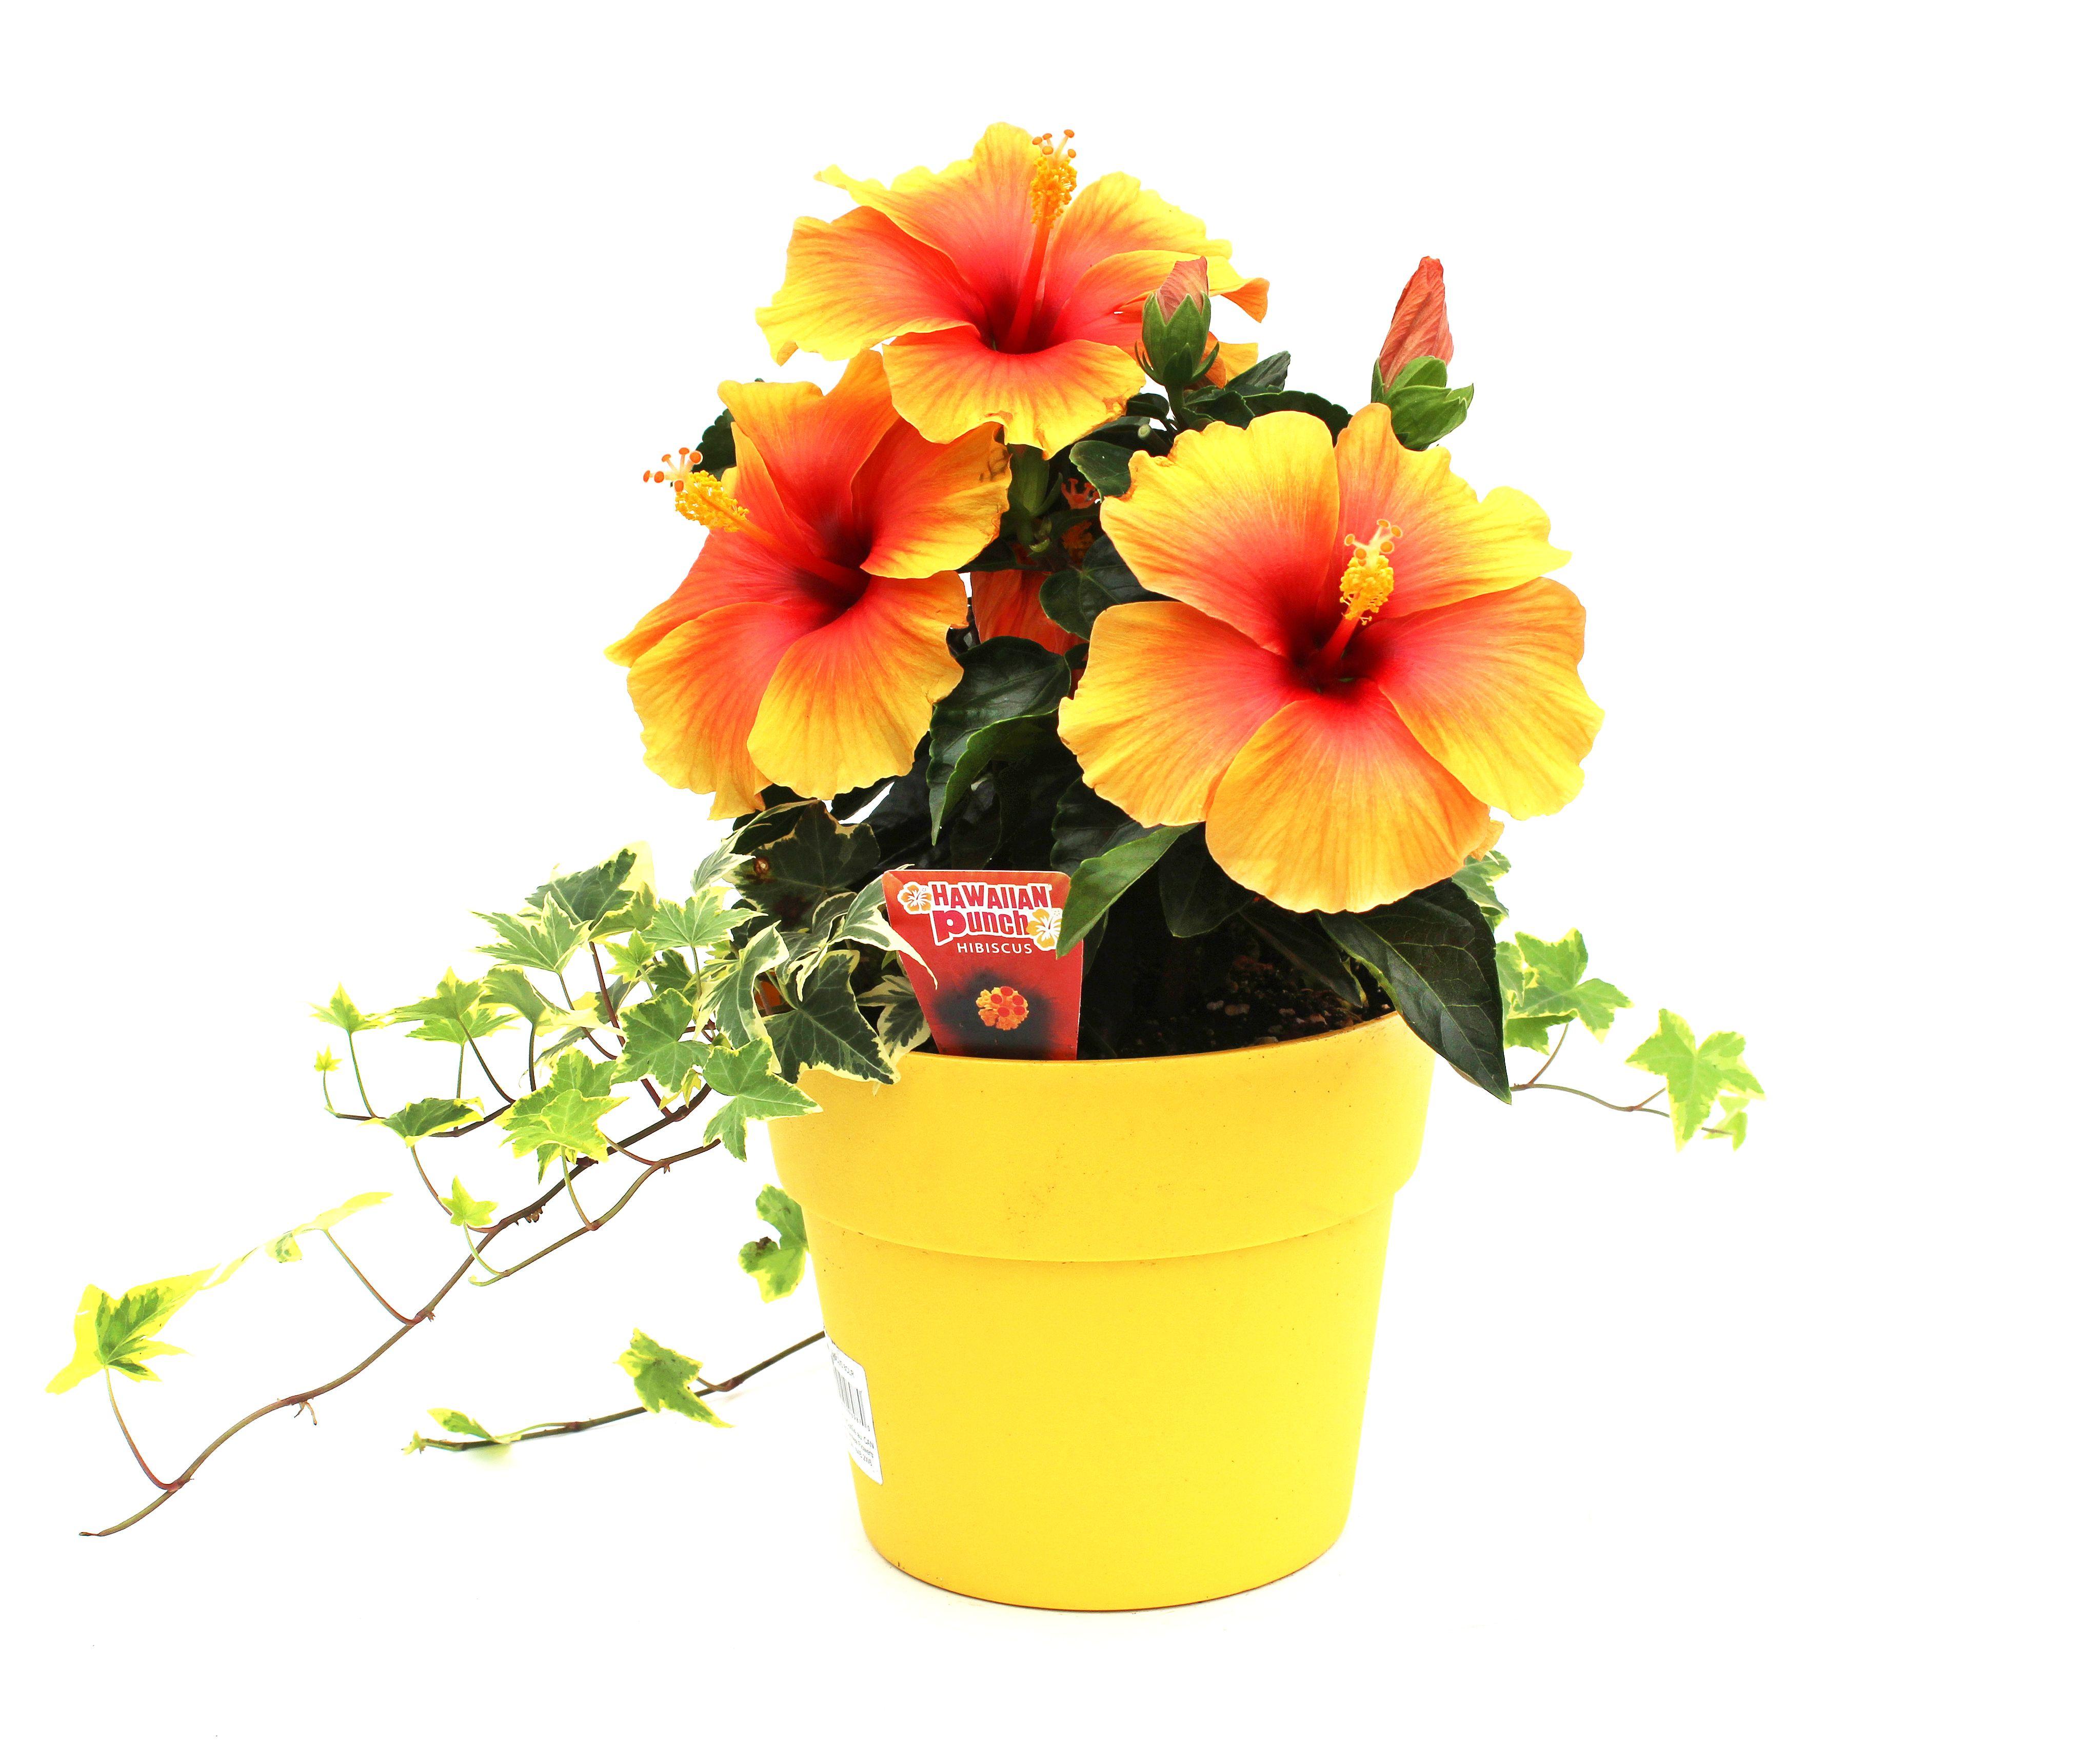 Hibiscus Plant In 2020 Hibiscus Plant Hibiscus Hybrid Tea Roses